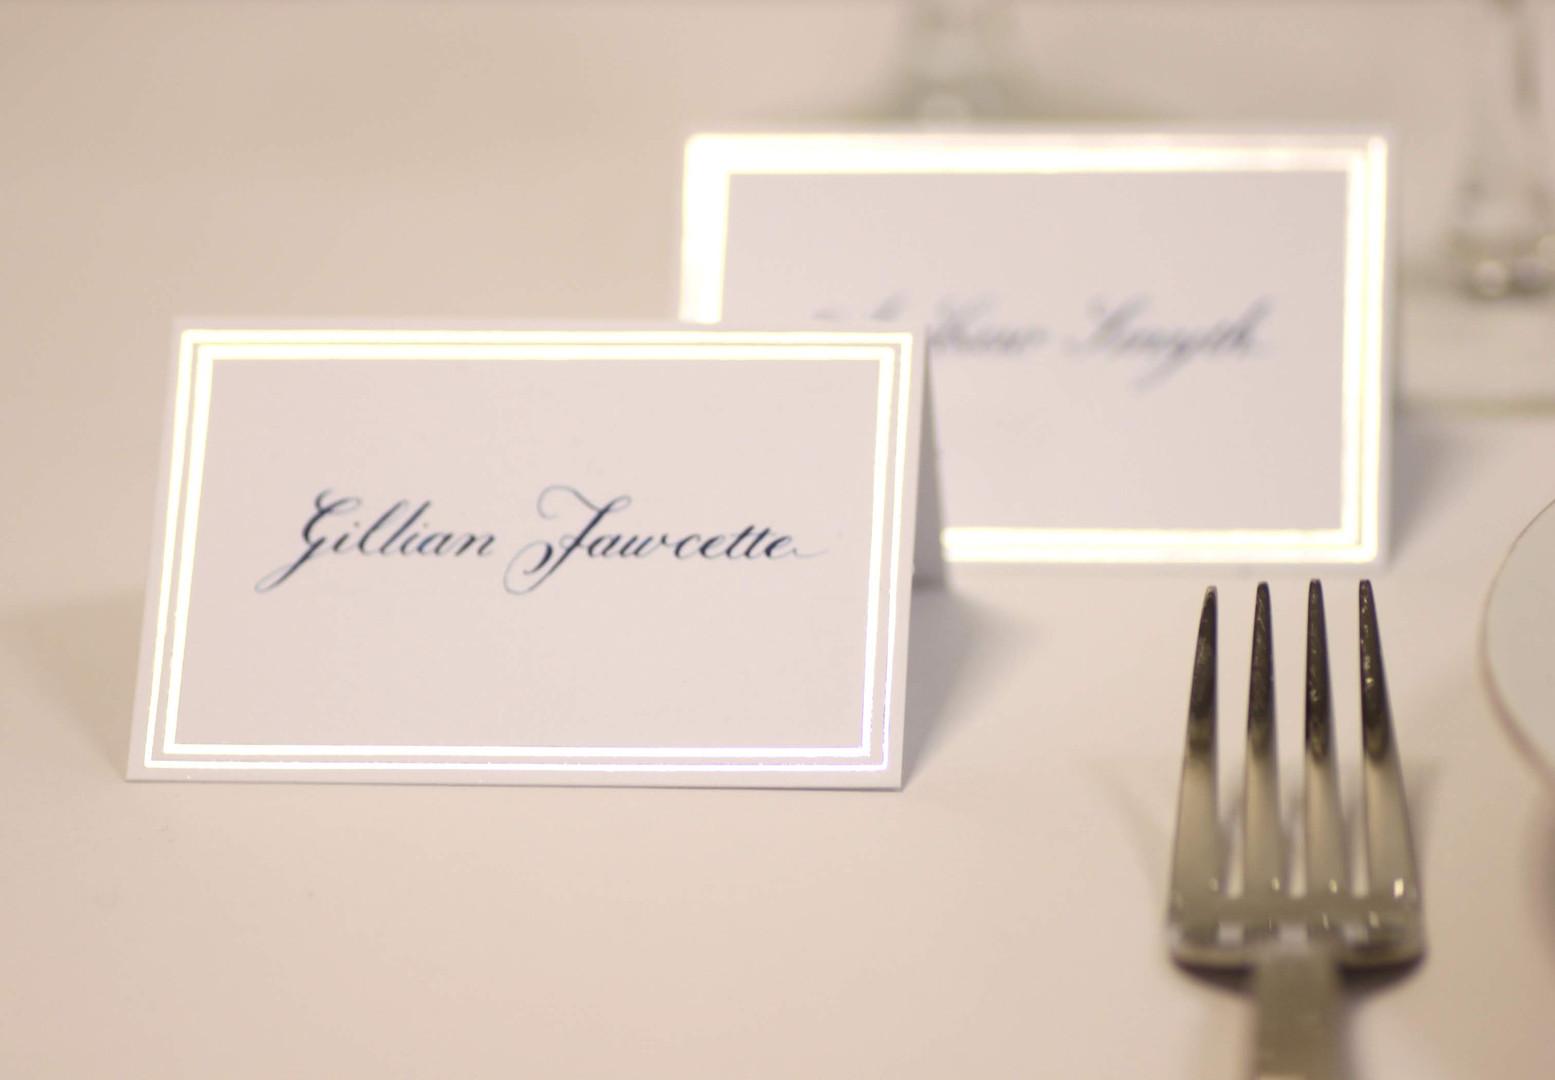 Gillian Fawcette_place name.IMG_6265 - C